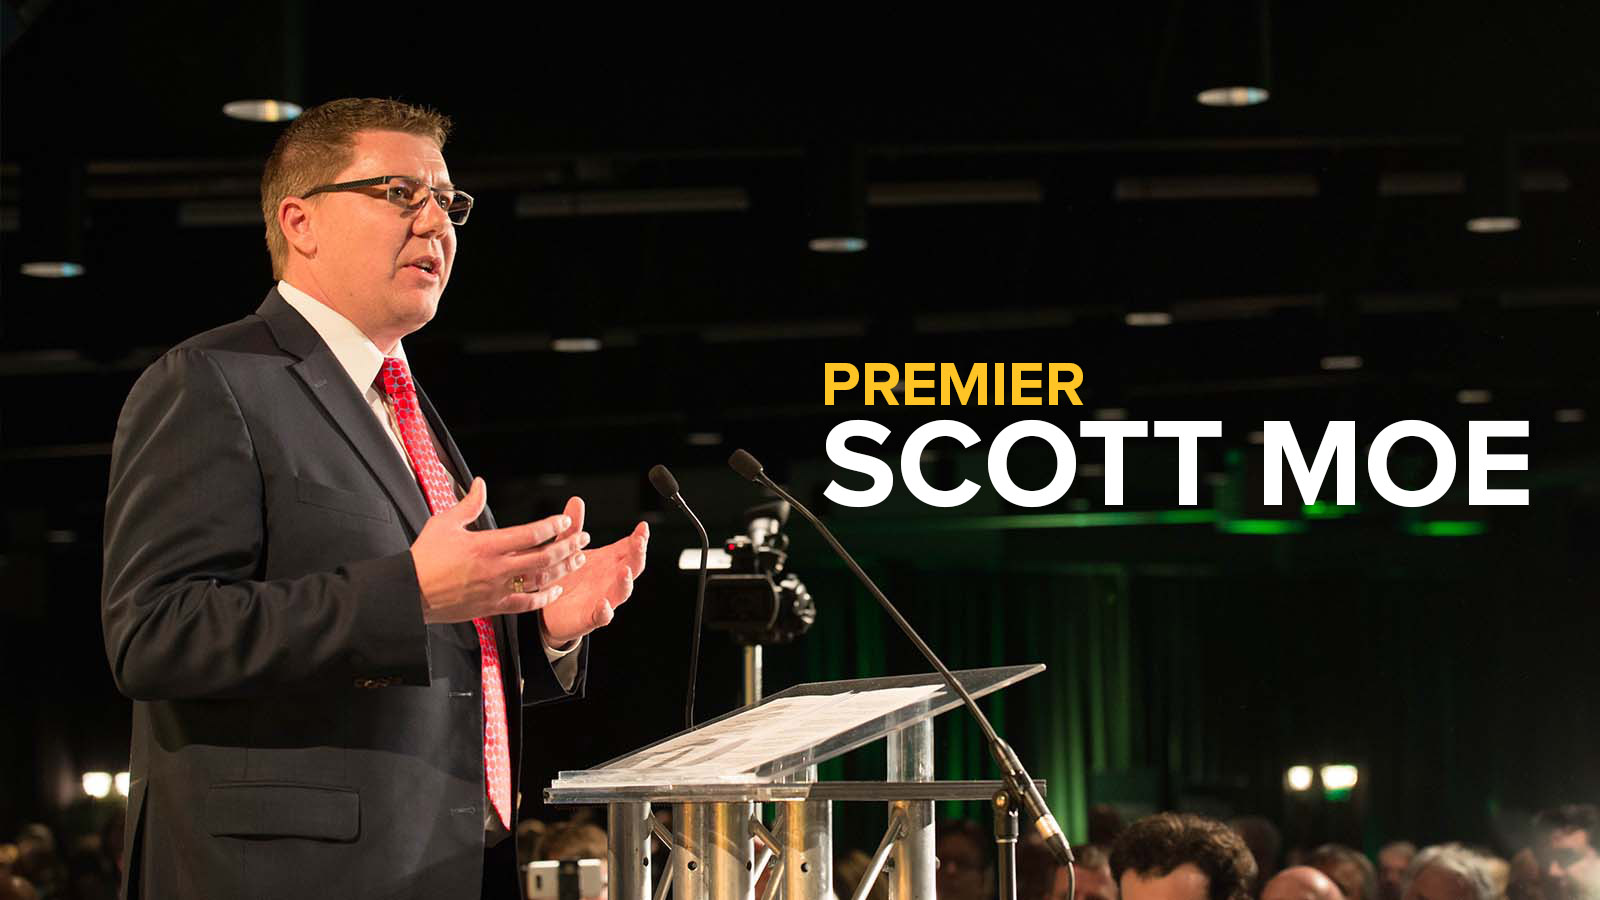 Premier Scott Moe